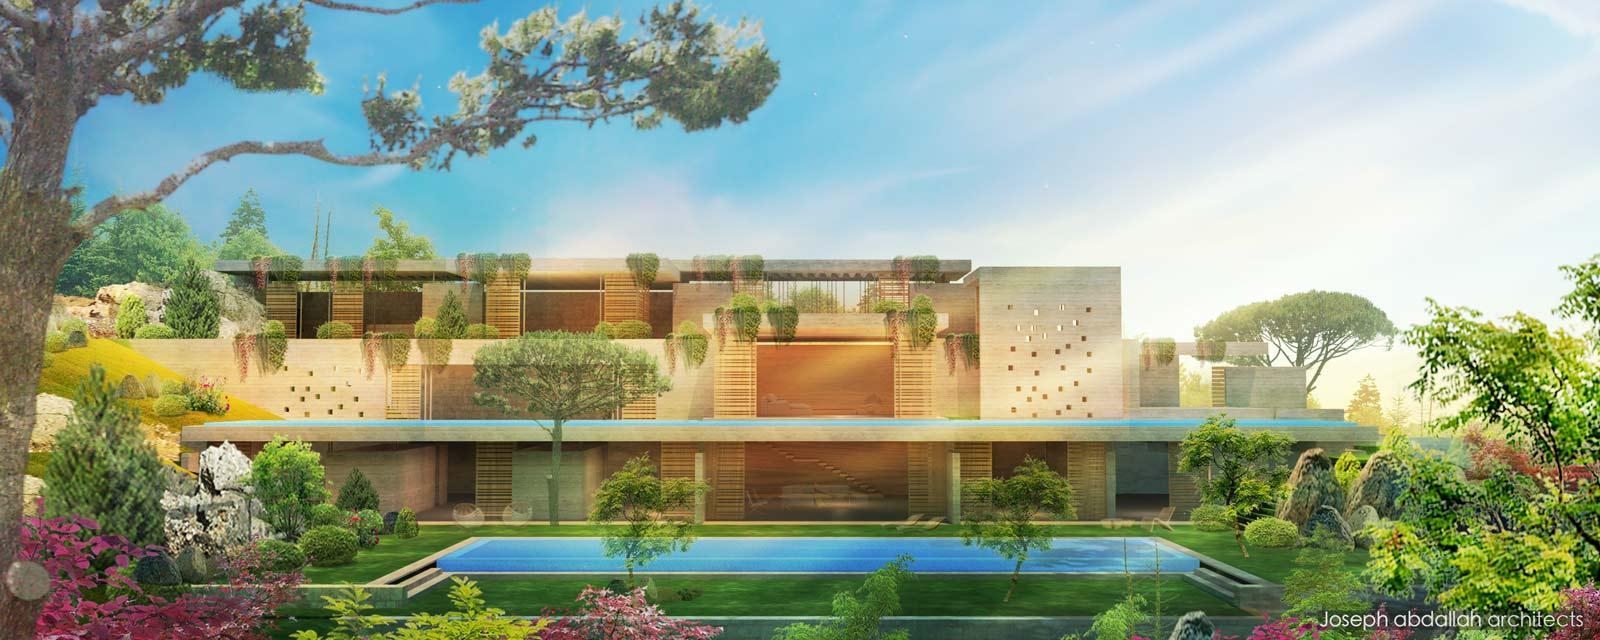 nassif-water-mirror-villa-lebanon-joseph-abdallah-architects-4